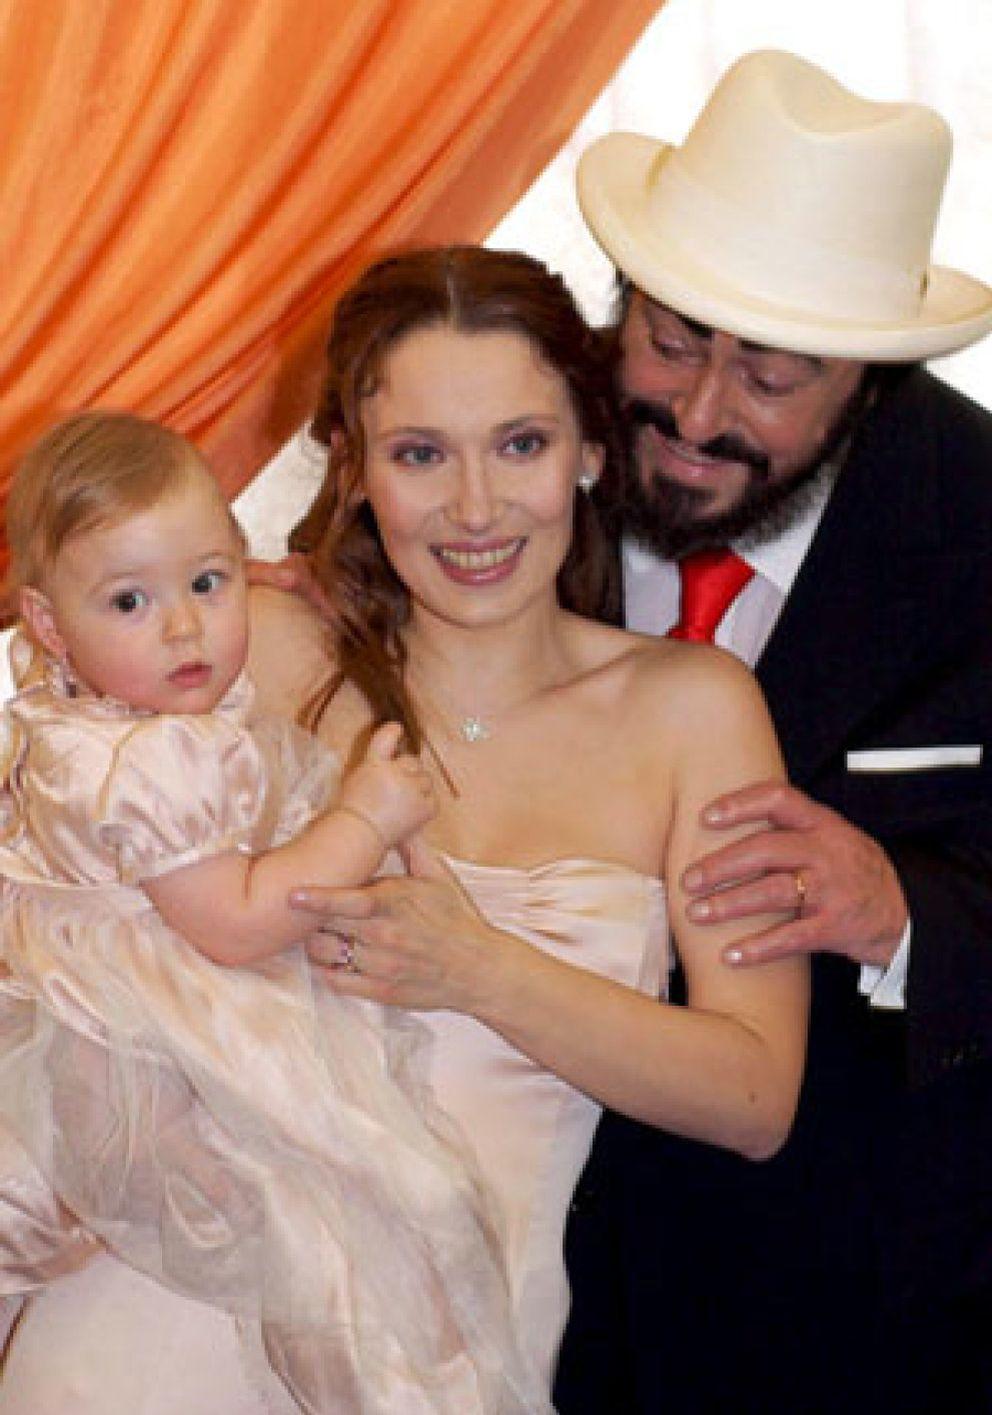 Nicoletta mantovani registra el nombre pavarotti como marca for Luciano pavarotti nicoletta mantovani